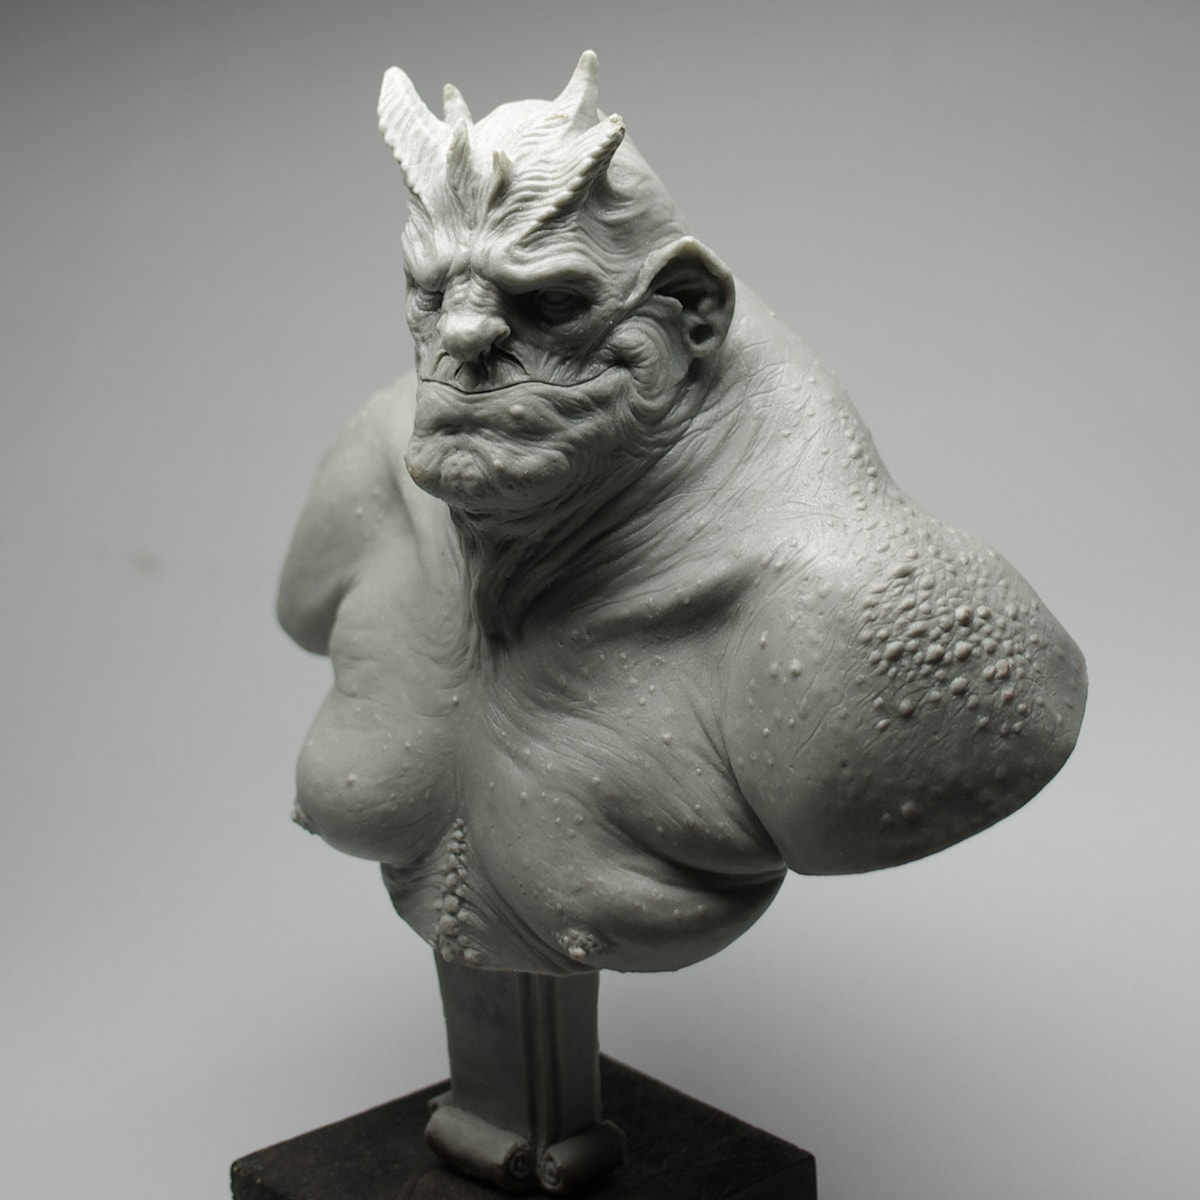 Demon-obese3